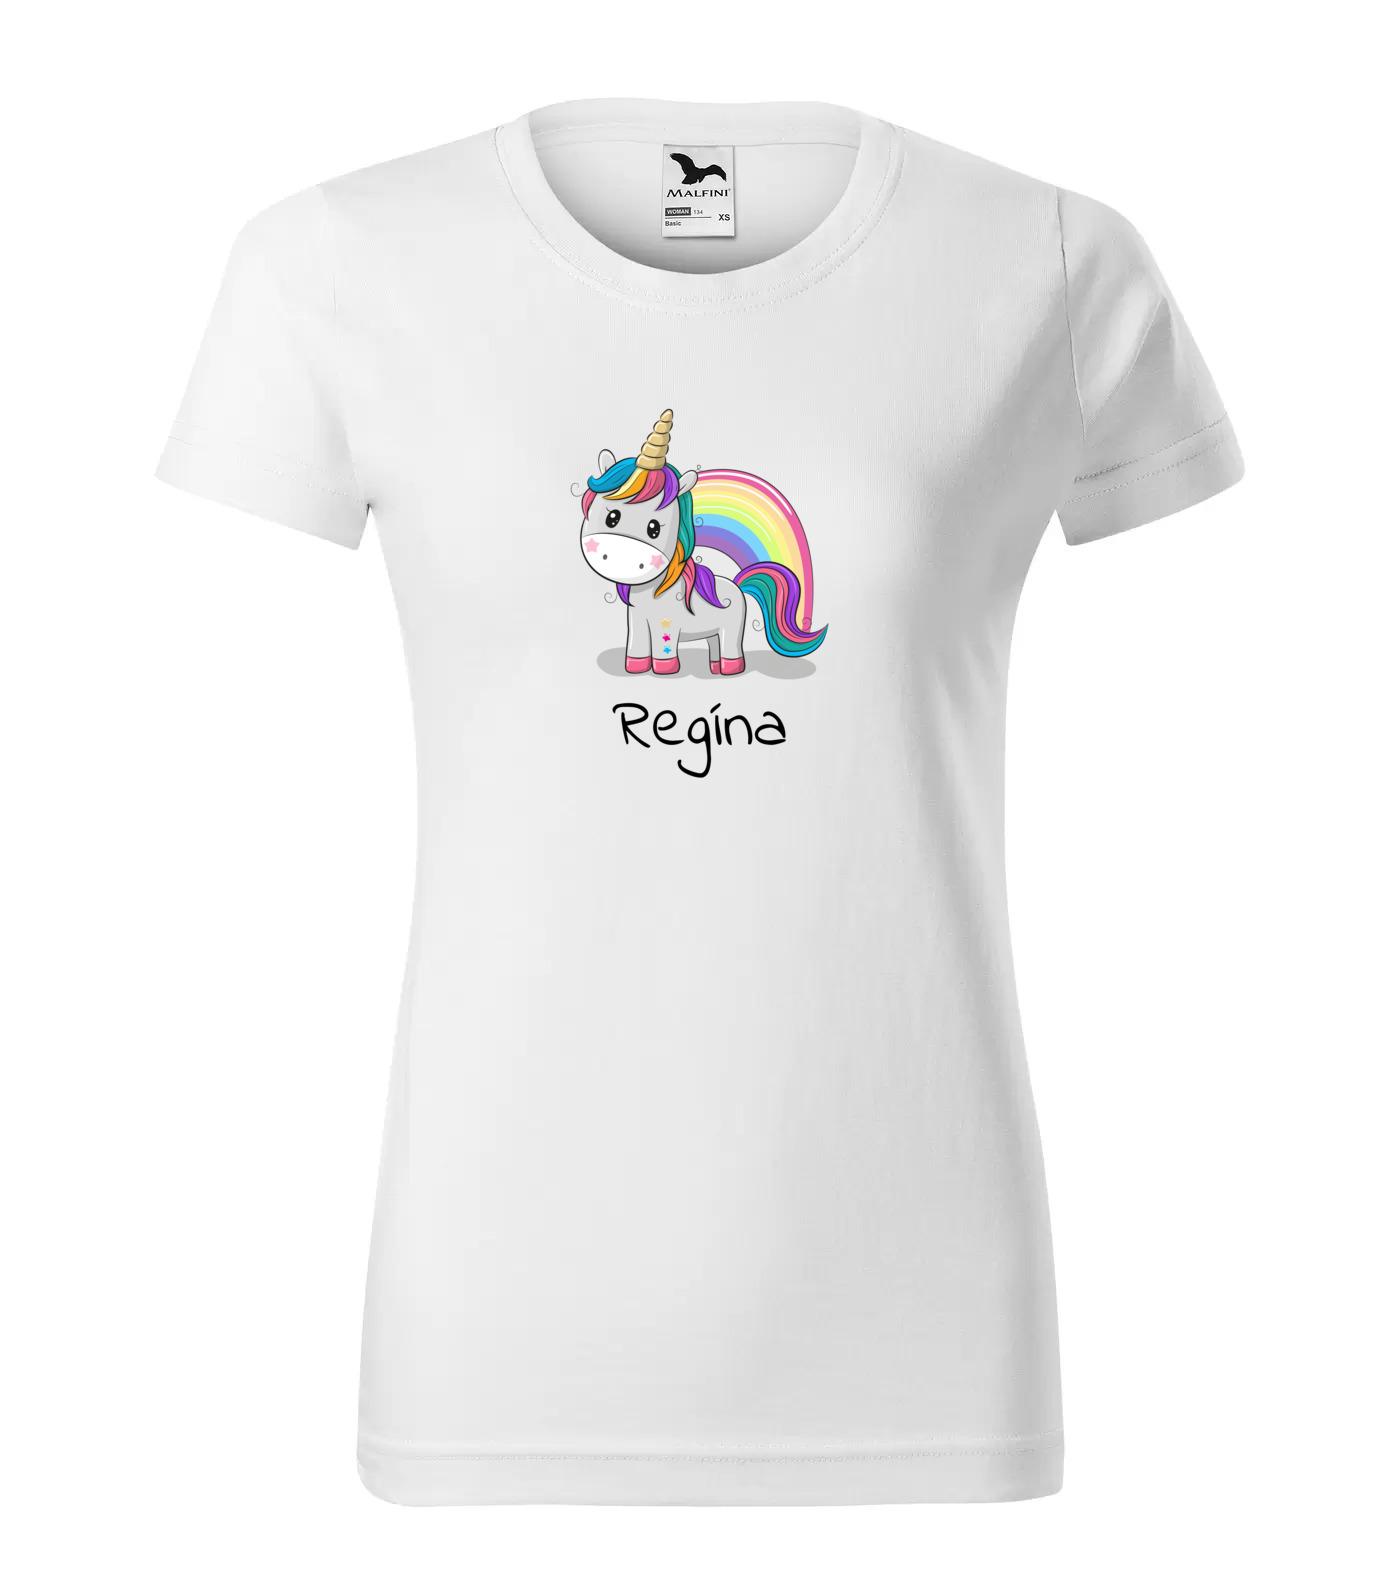 Tričko Jednorožec Regína